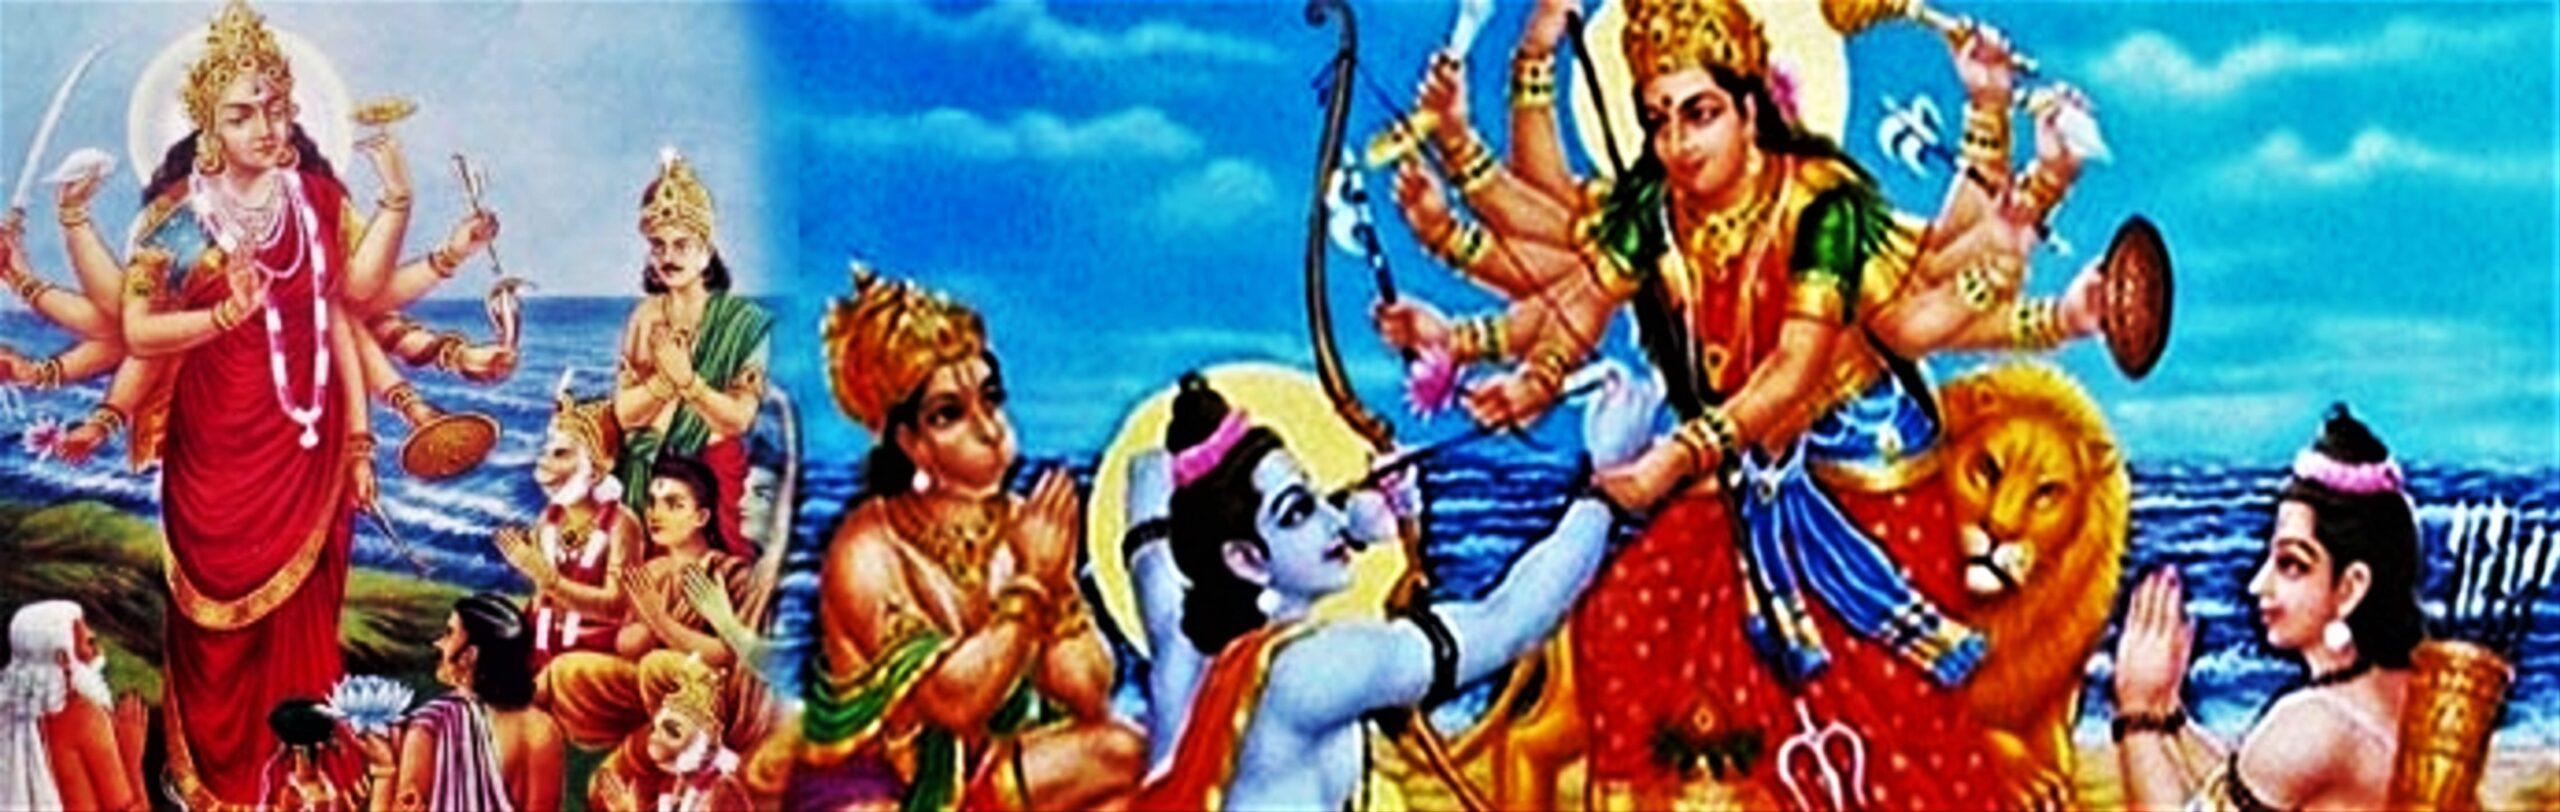 Akalbodhan - Worship of Goddess Durga by Lord Rama before killing Ravana | PC - bangalinet.com